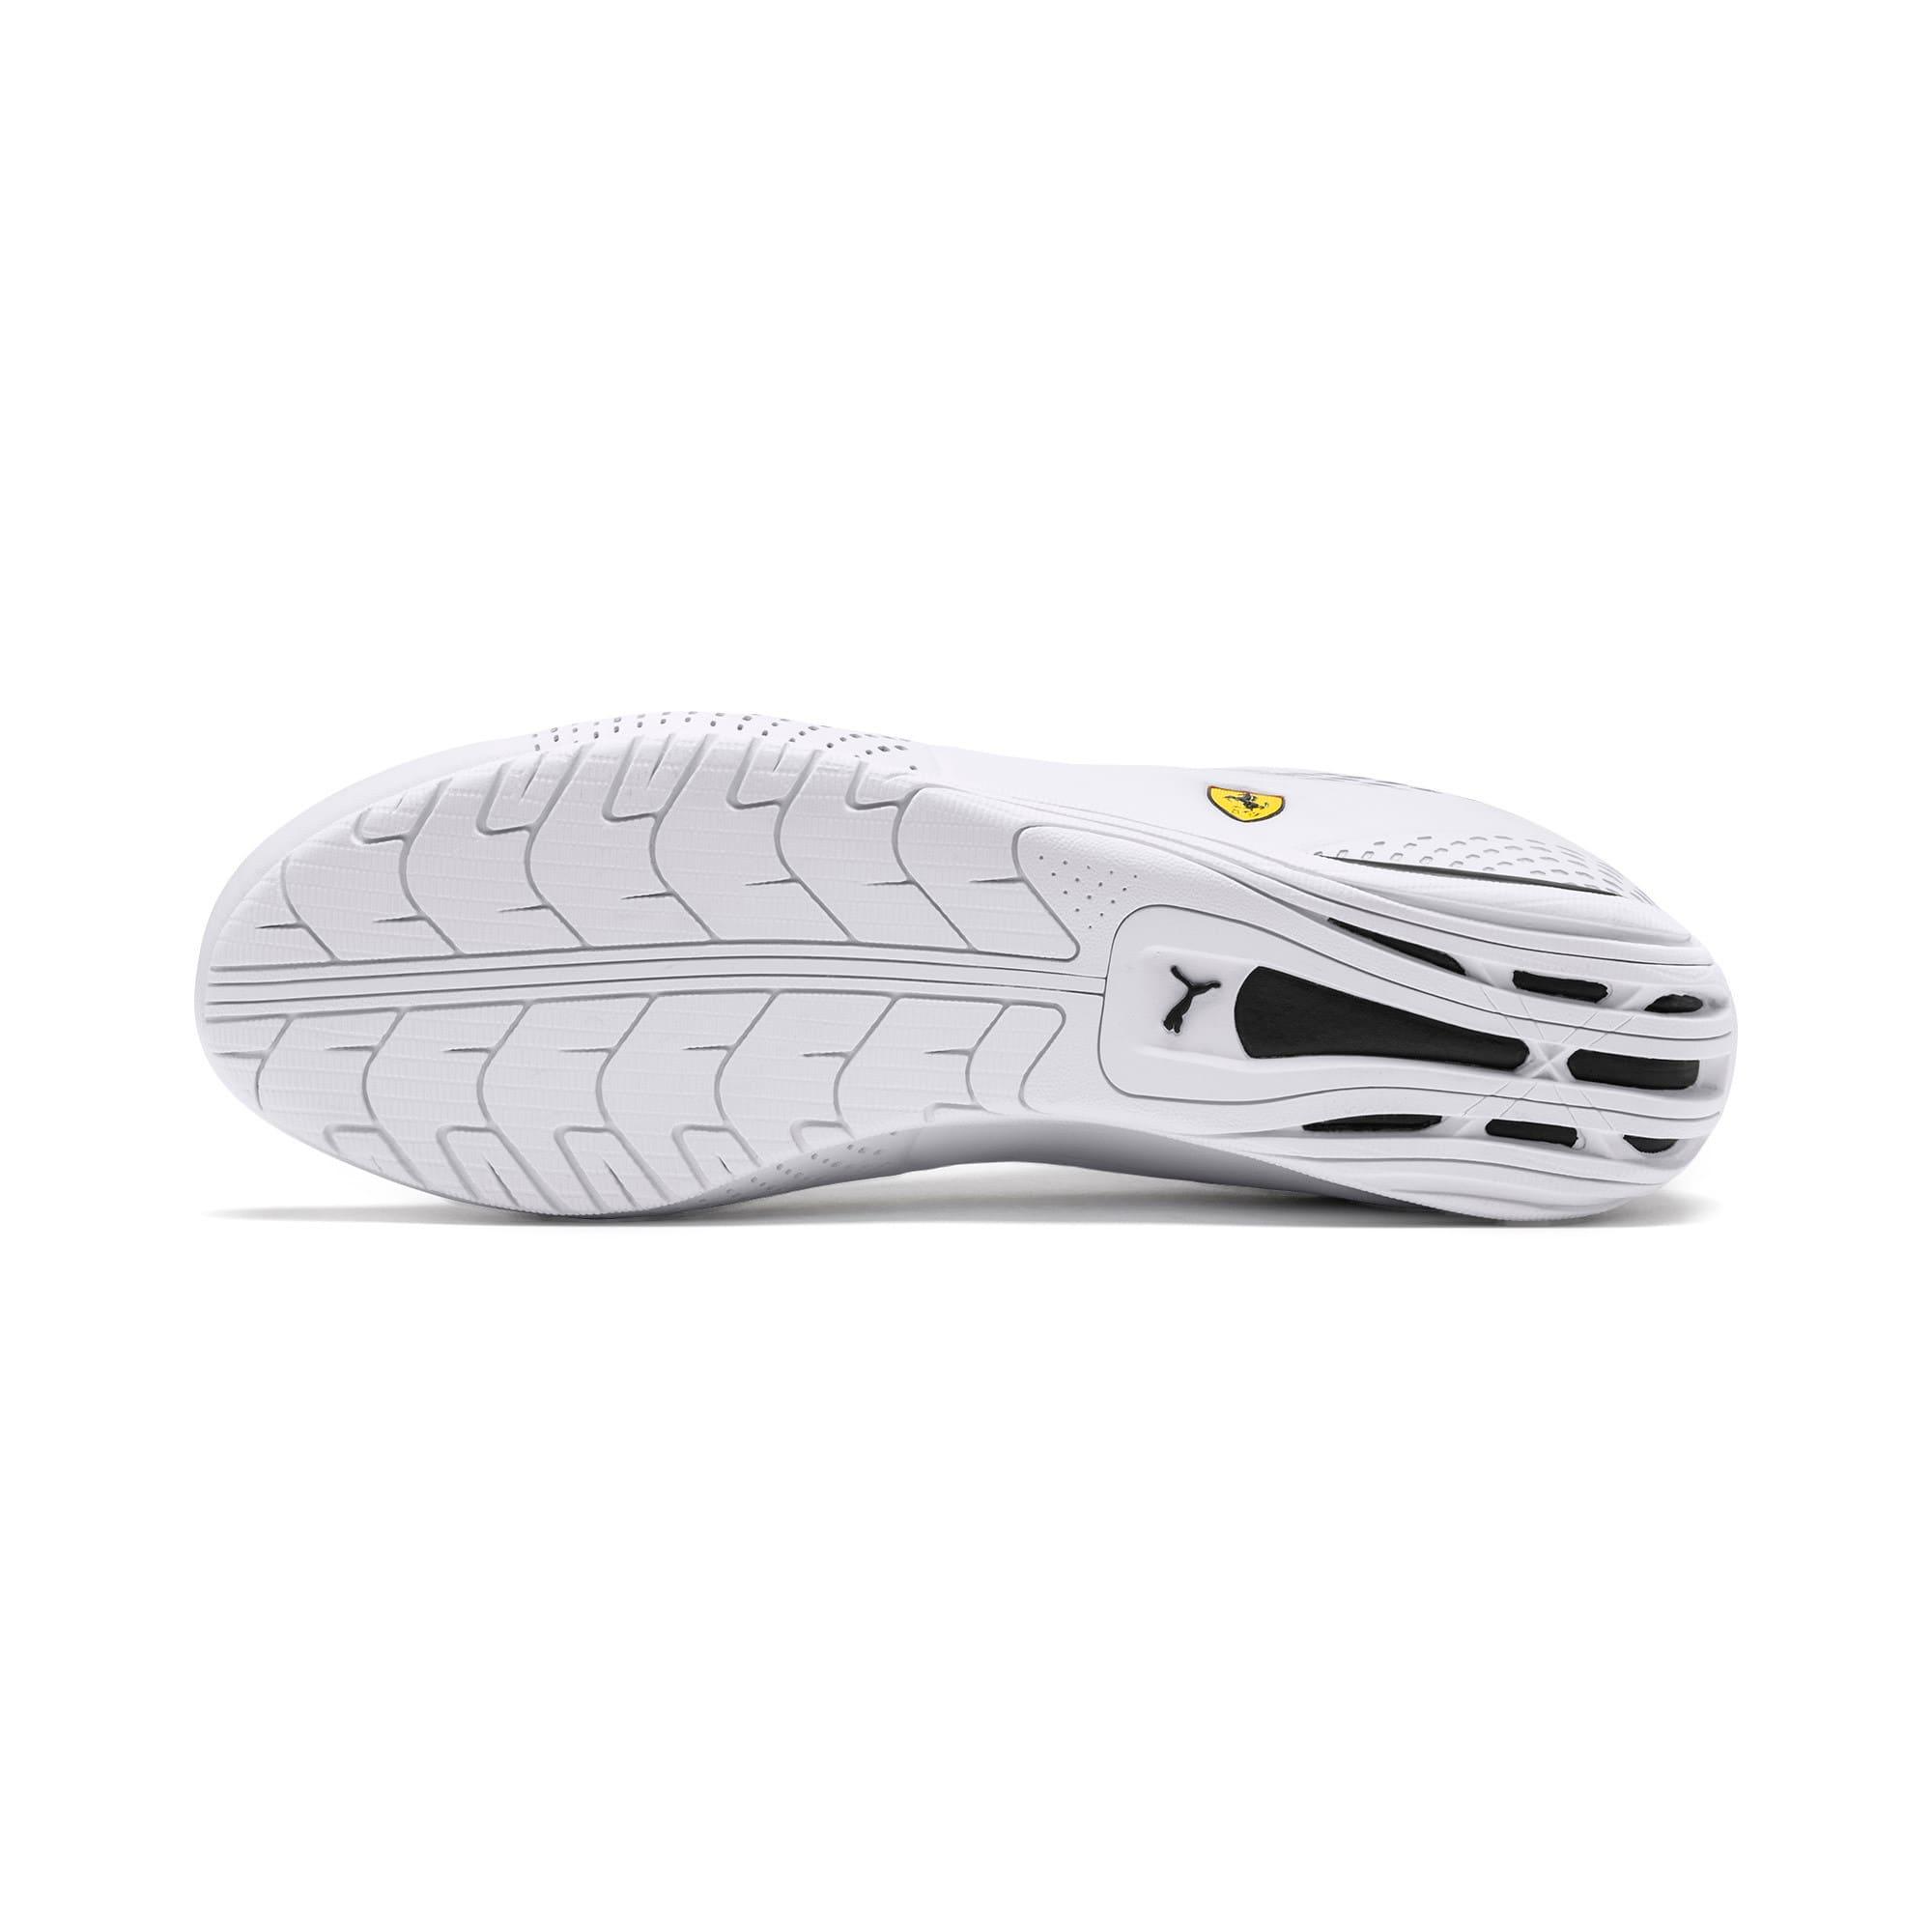 Thumbnail 5 of Scuderia Ferrari Drift Cat 5 Ultra II Shoes, Puma White-Puma Black, medium